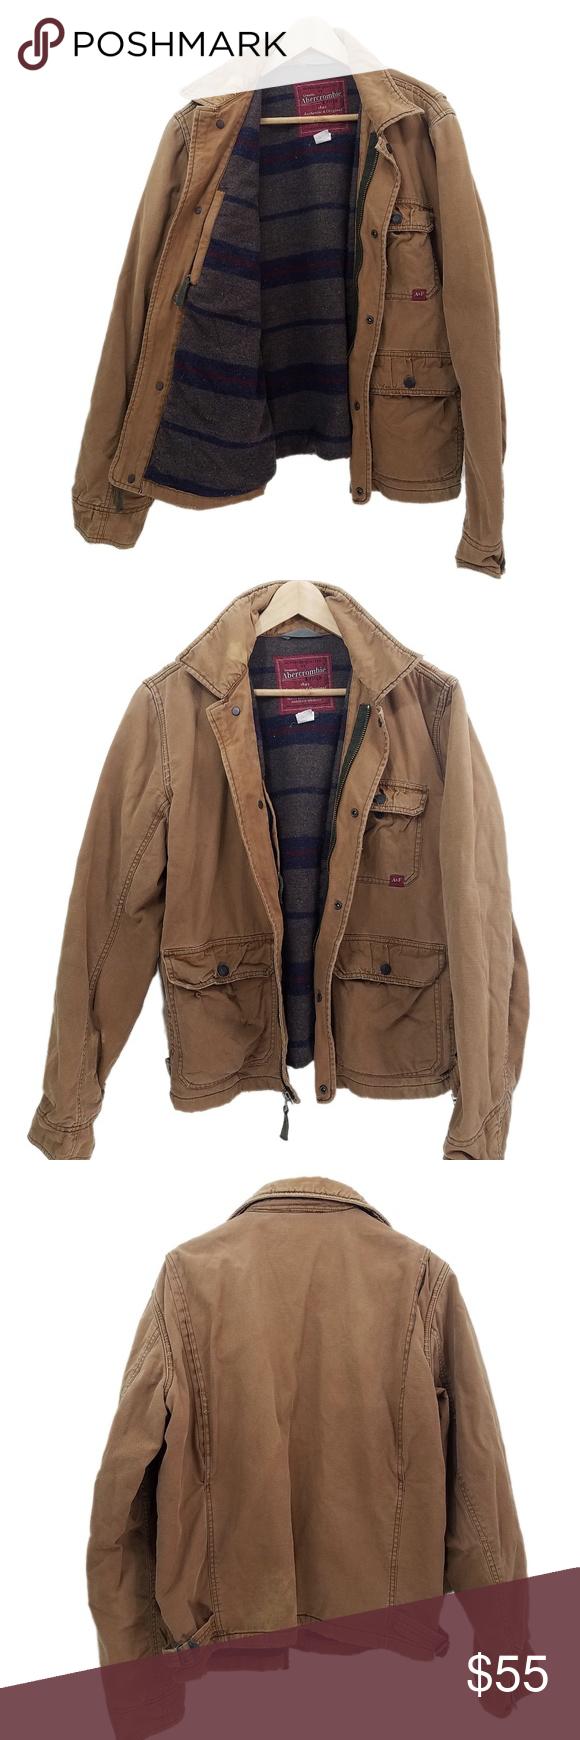 Abercrombie u fitch distressed mens winter jacket mens winter